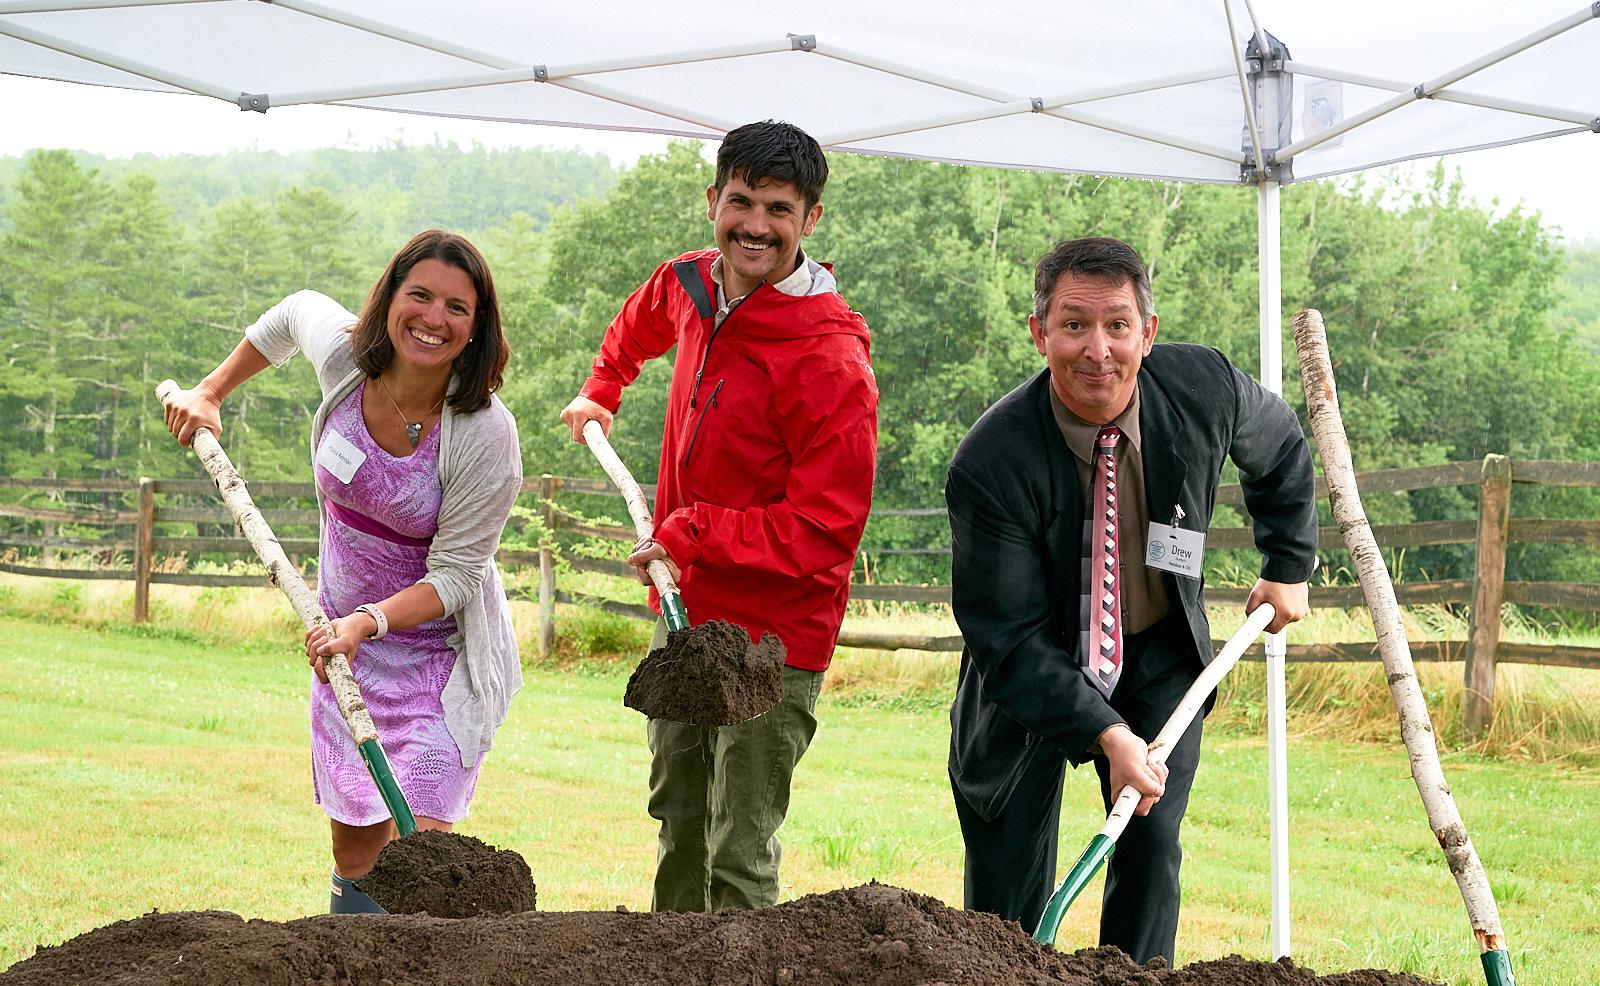 Jessica Keenan, Joel Alex, and Drew Dumsch at River Bend Farm's Groundbreaking Ceremony in July 2019.